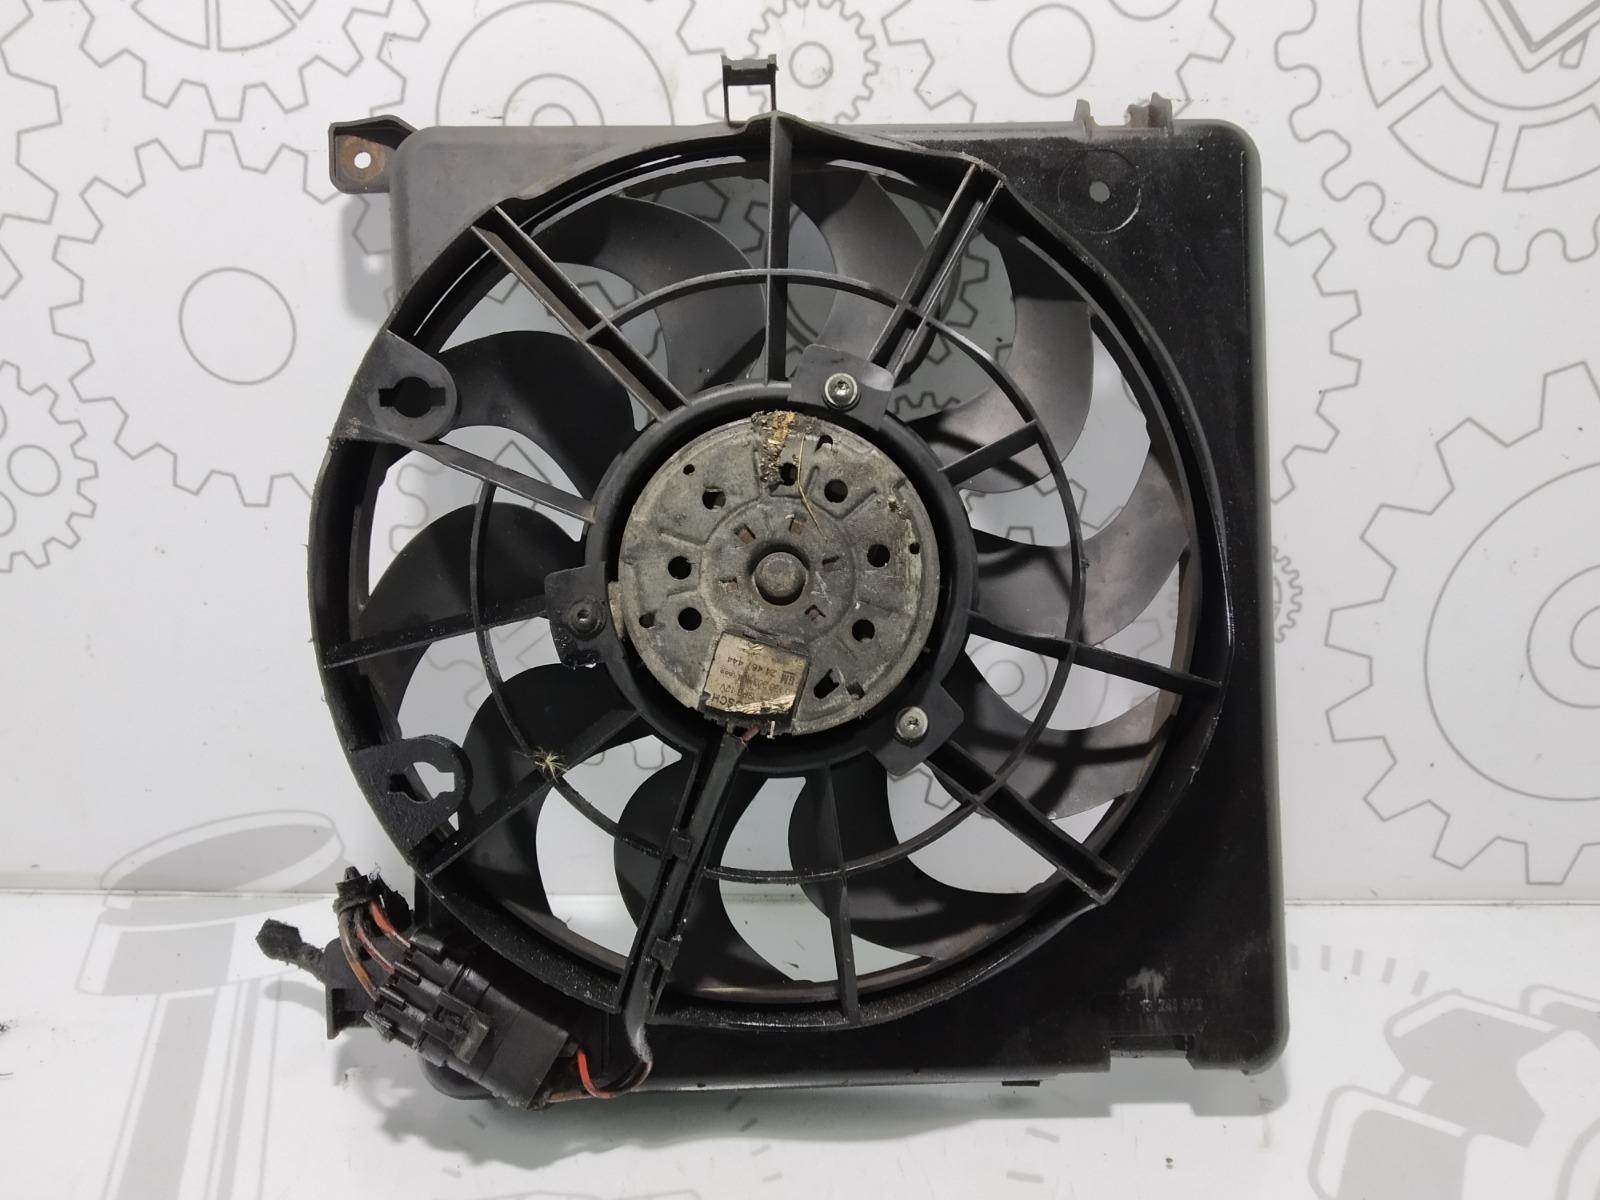 Вентилятор радиатора Opel Astra H 1.7 CDTI 2007 (б/у)